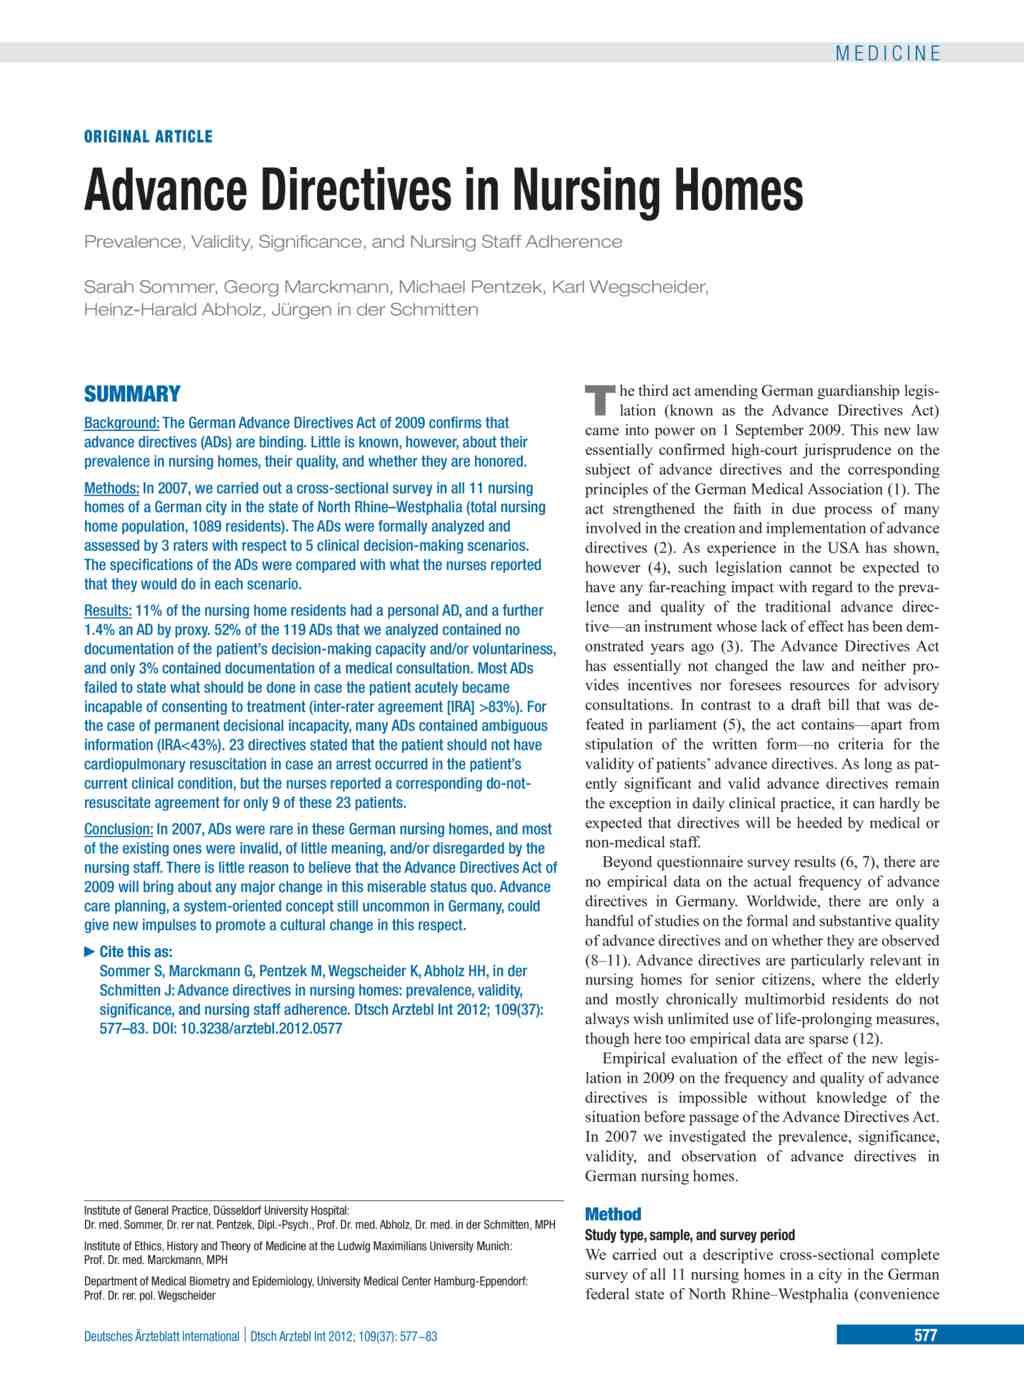 Advance Directives In Nursing Homes 14092012